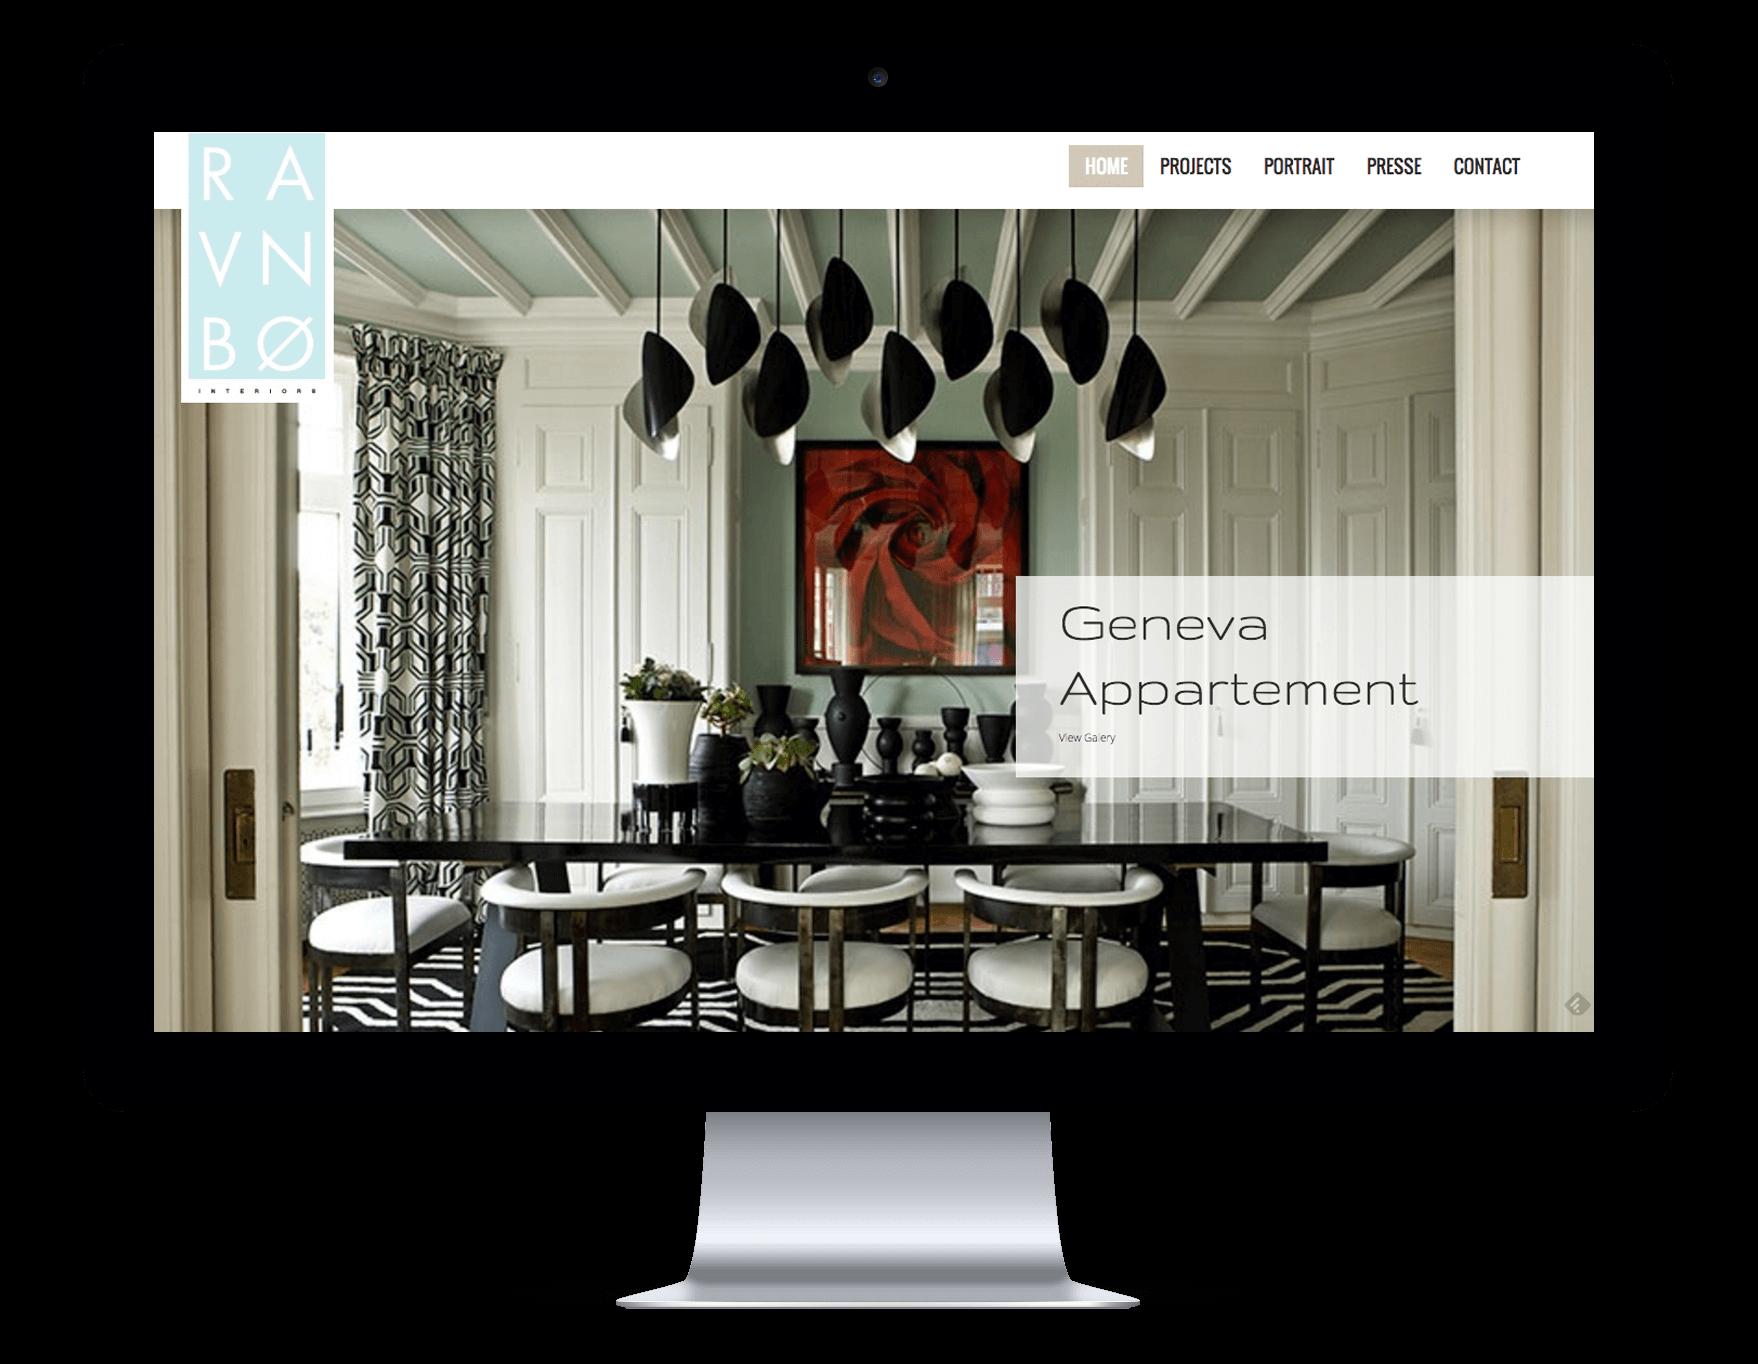 Capture du site internet Ravnbo Interiors